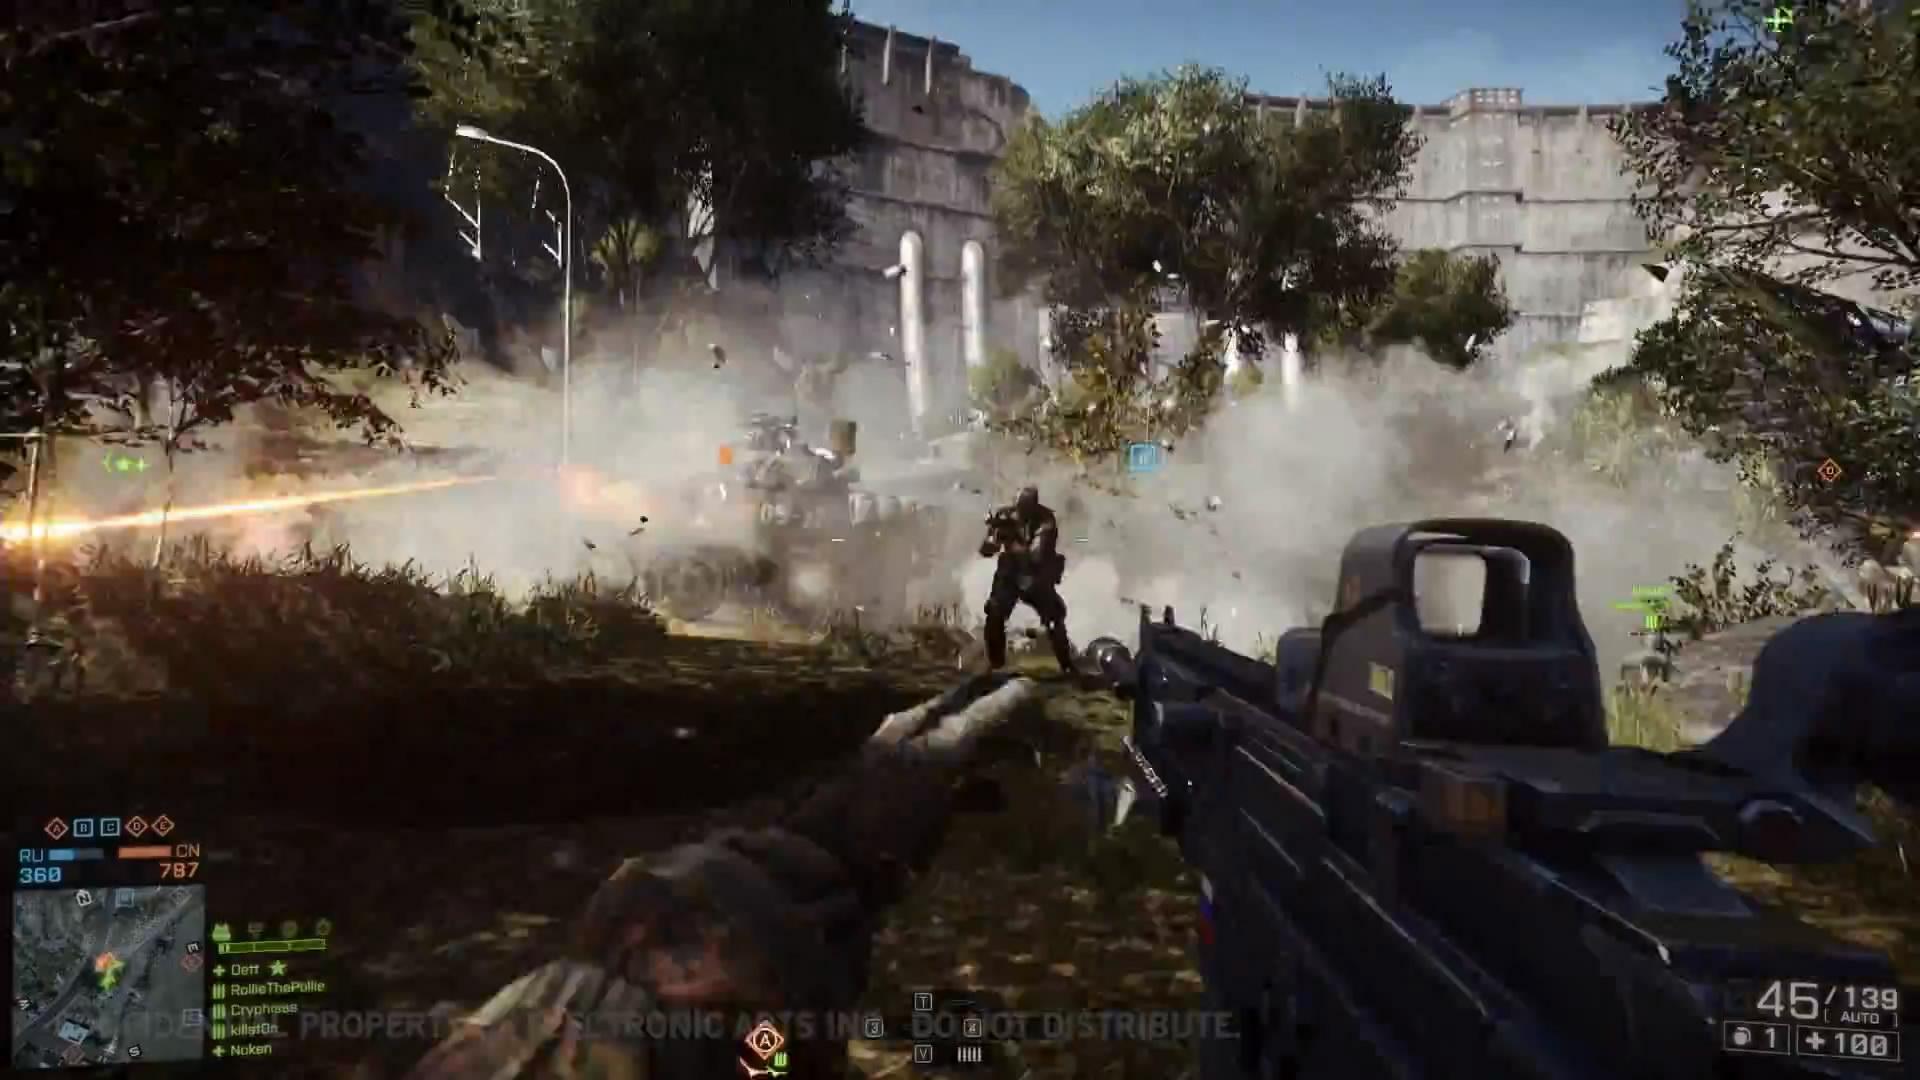 Battlefield-Hardline-Real-Gameplay.mp4_snapshot_00.30_2014.05.28_12.47.26